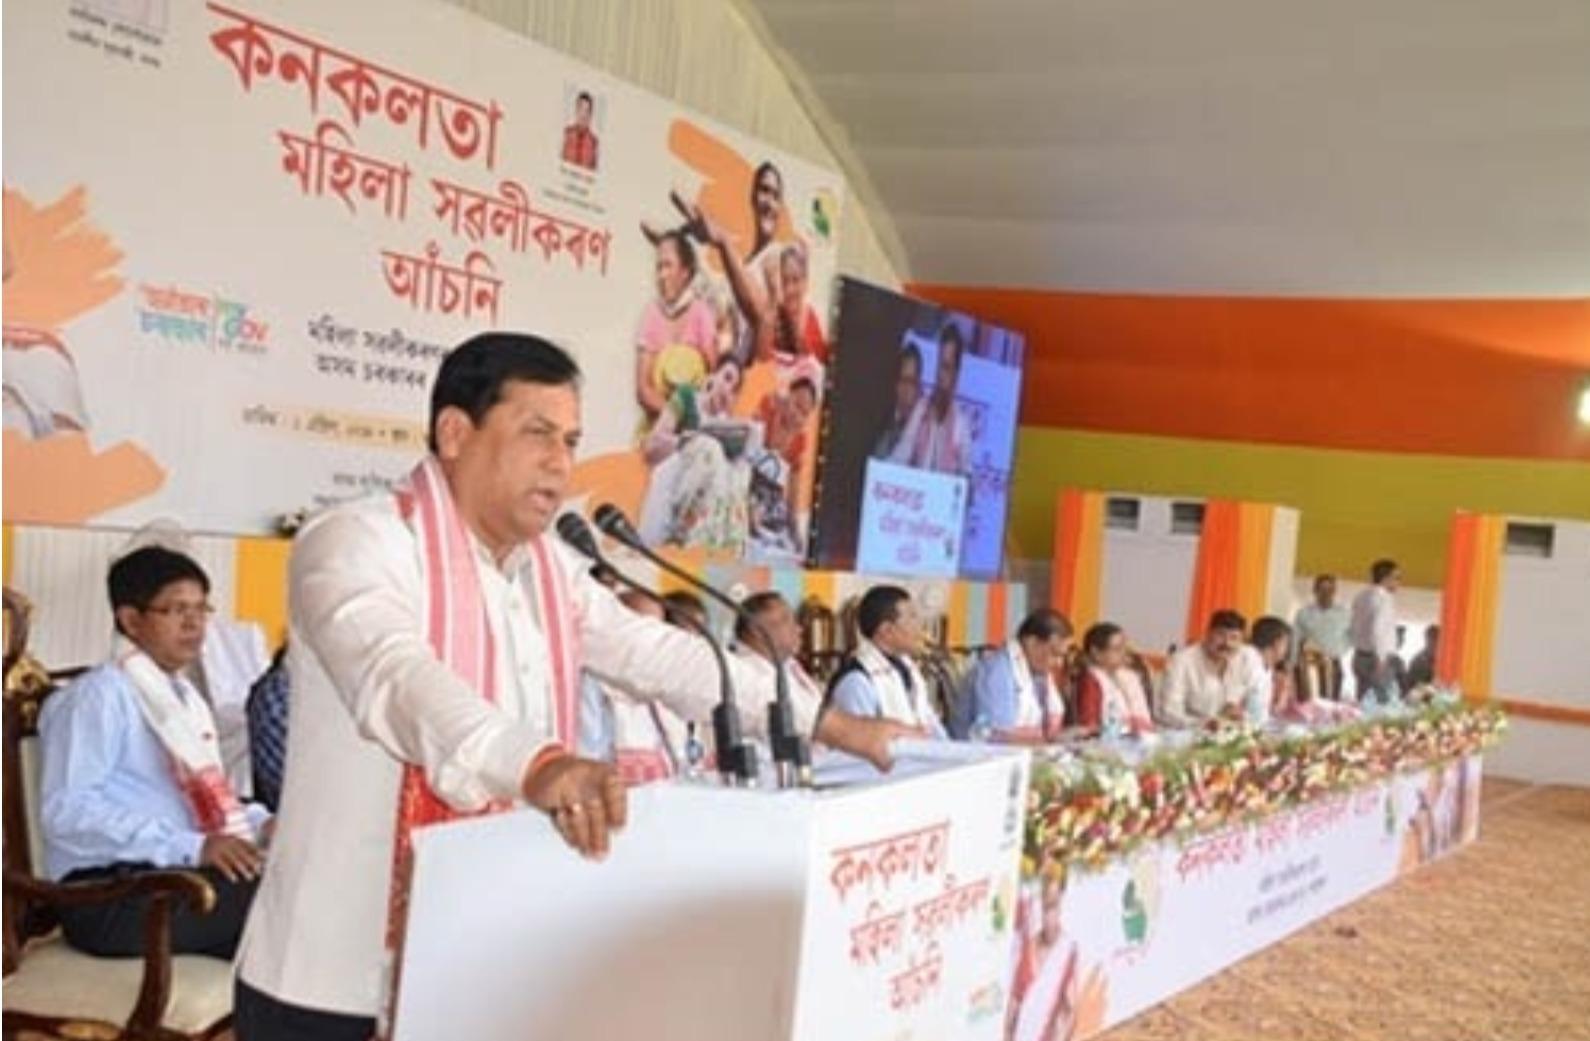 Technical Training Must for Women Empowerment, Stresses Assam CM Sonowal